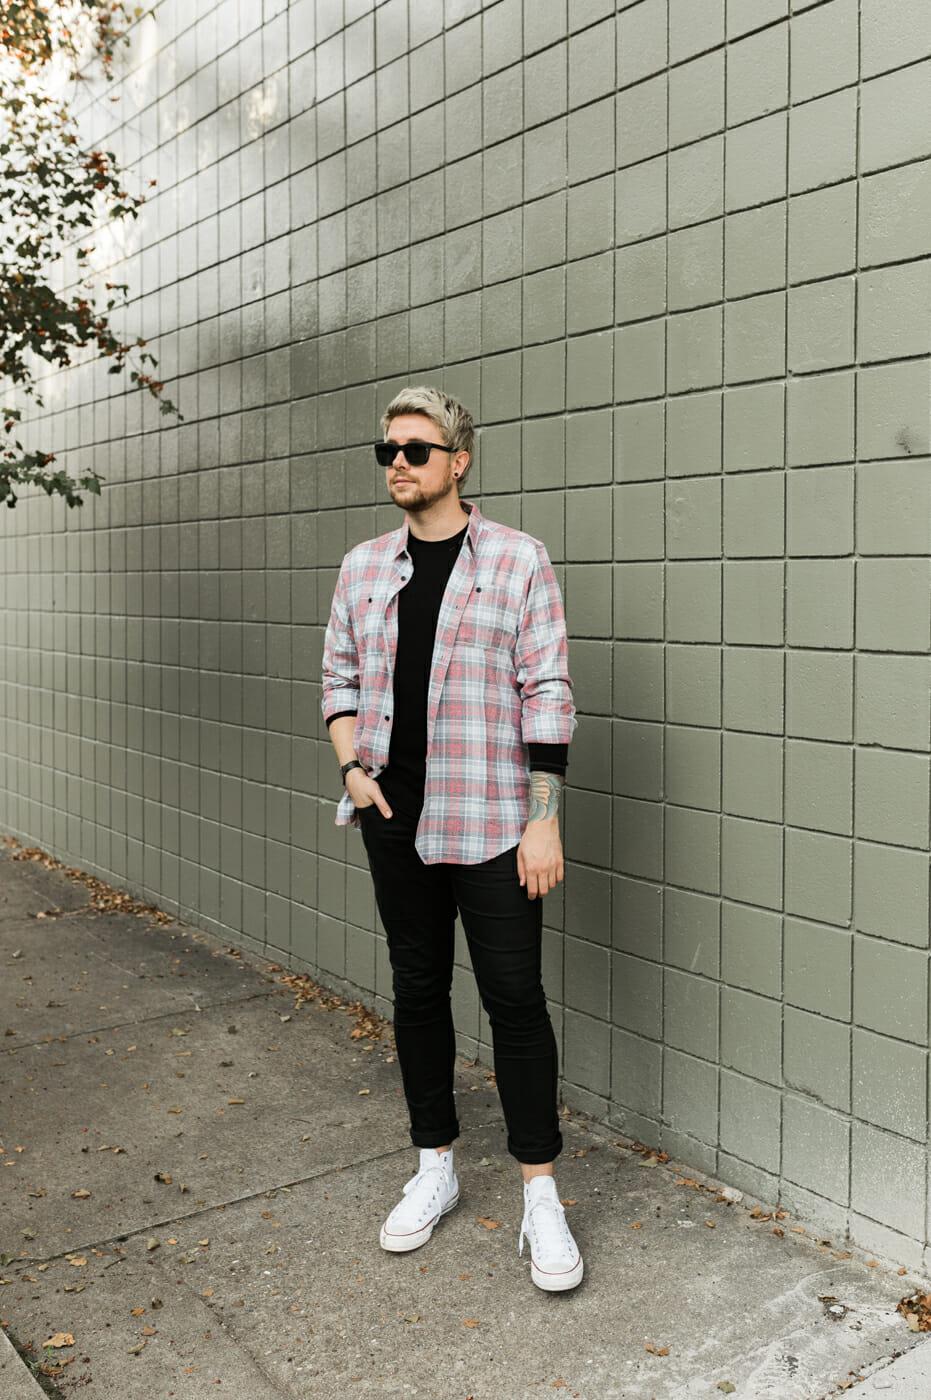 zappos-smartwool-mens-shirt-fall-fashion-the-kentucky-gent.jpg